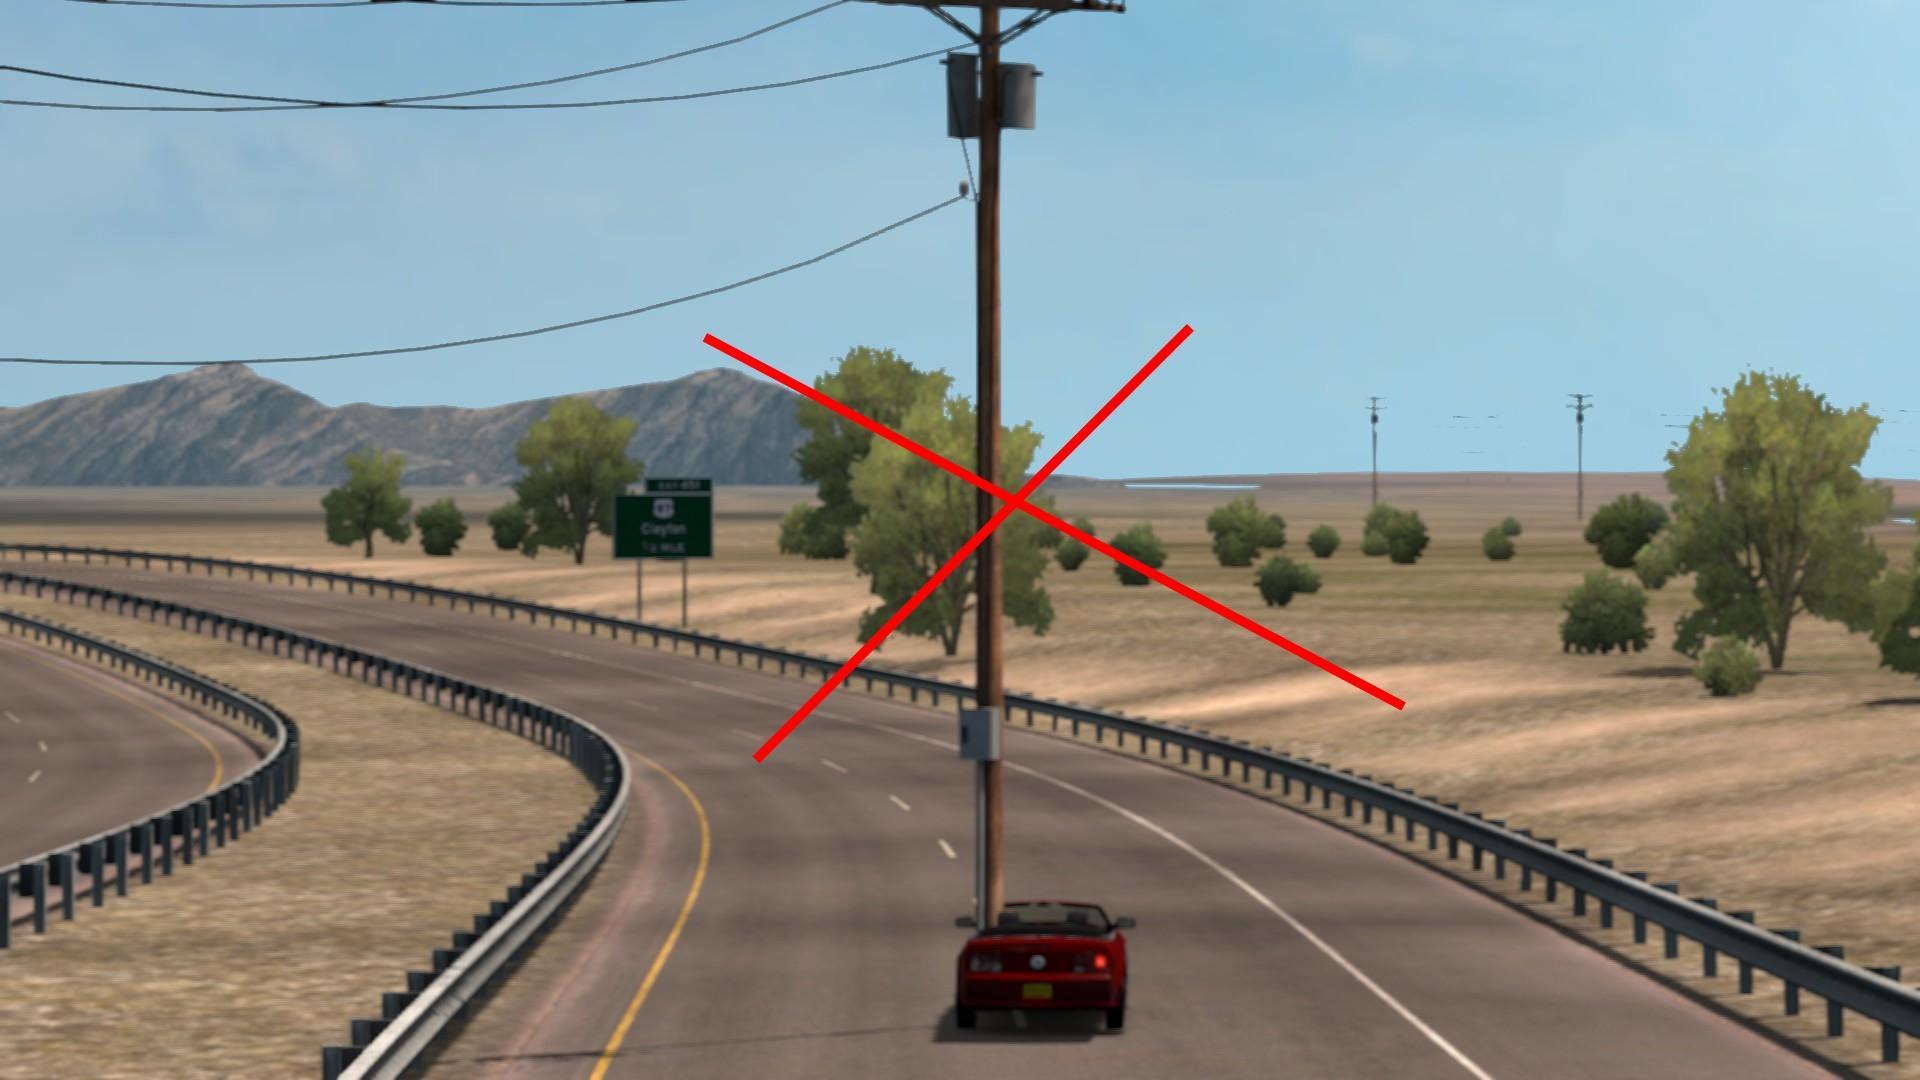 MAP COAST TO COAST V2 3 5 for ATS - ATS Mod | American Truck